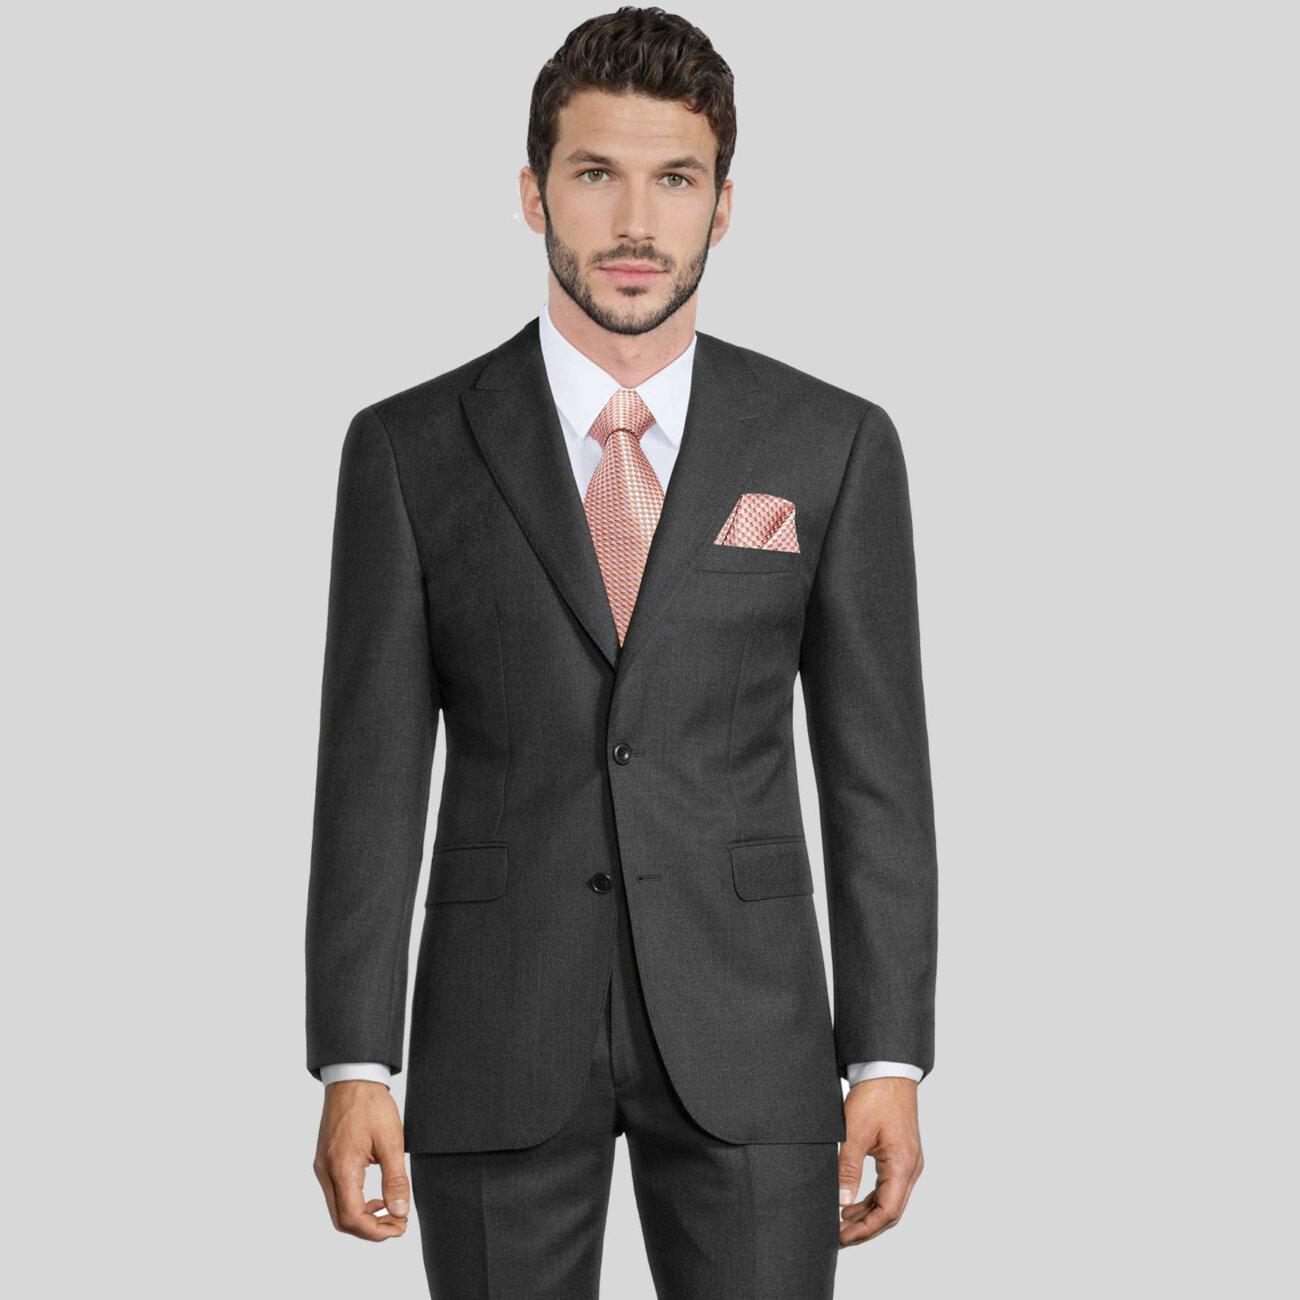 Charcoal Grey Mens Suit